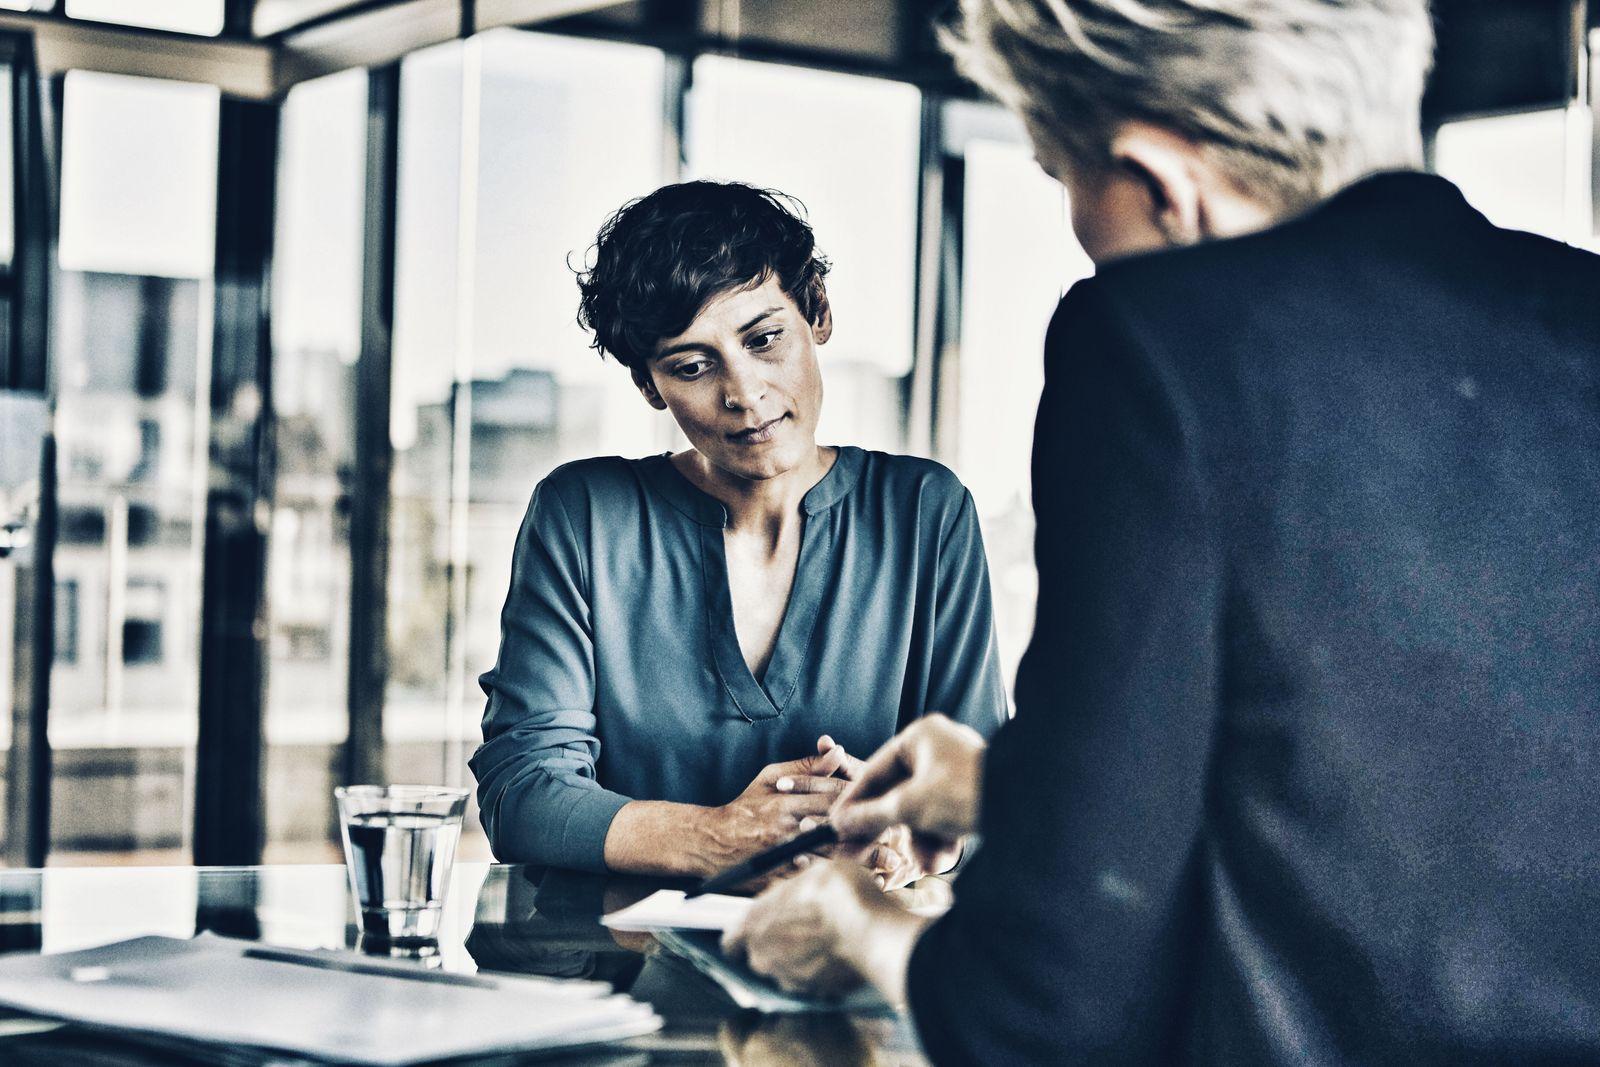 Two businesswomen talking at desk in office model released Symbolfoto property released PUBLICATIONx